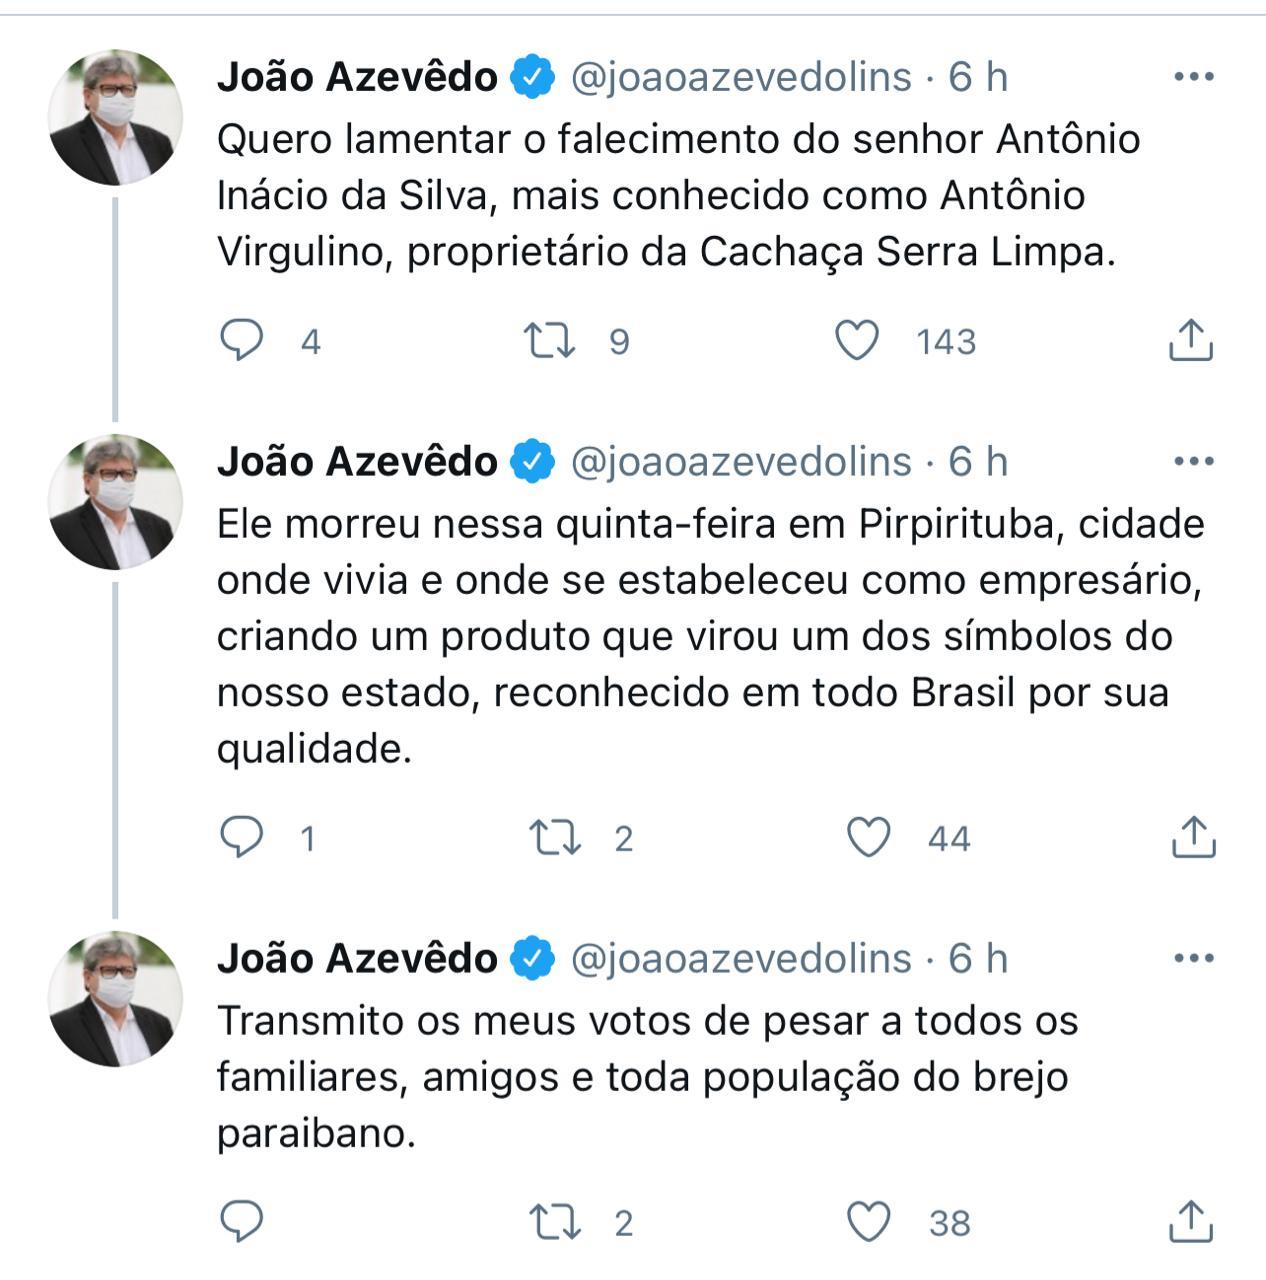 governador_joao_azevedo_lamenta_falecimento_de_Antonio_Inacio